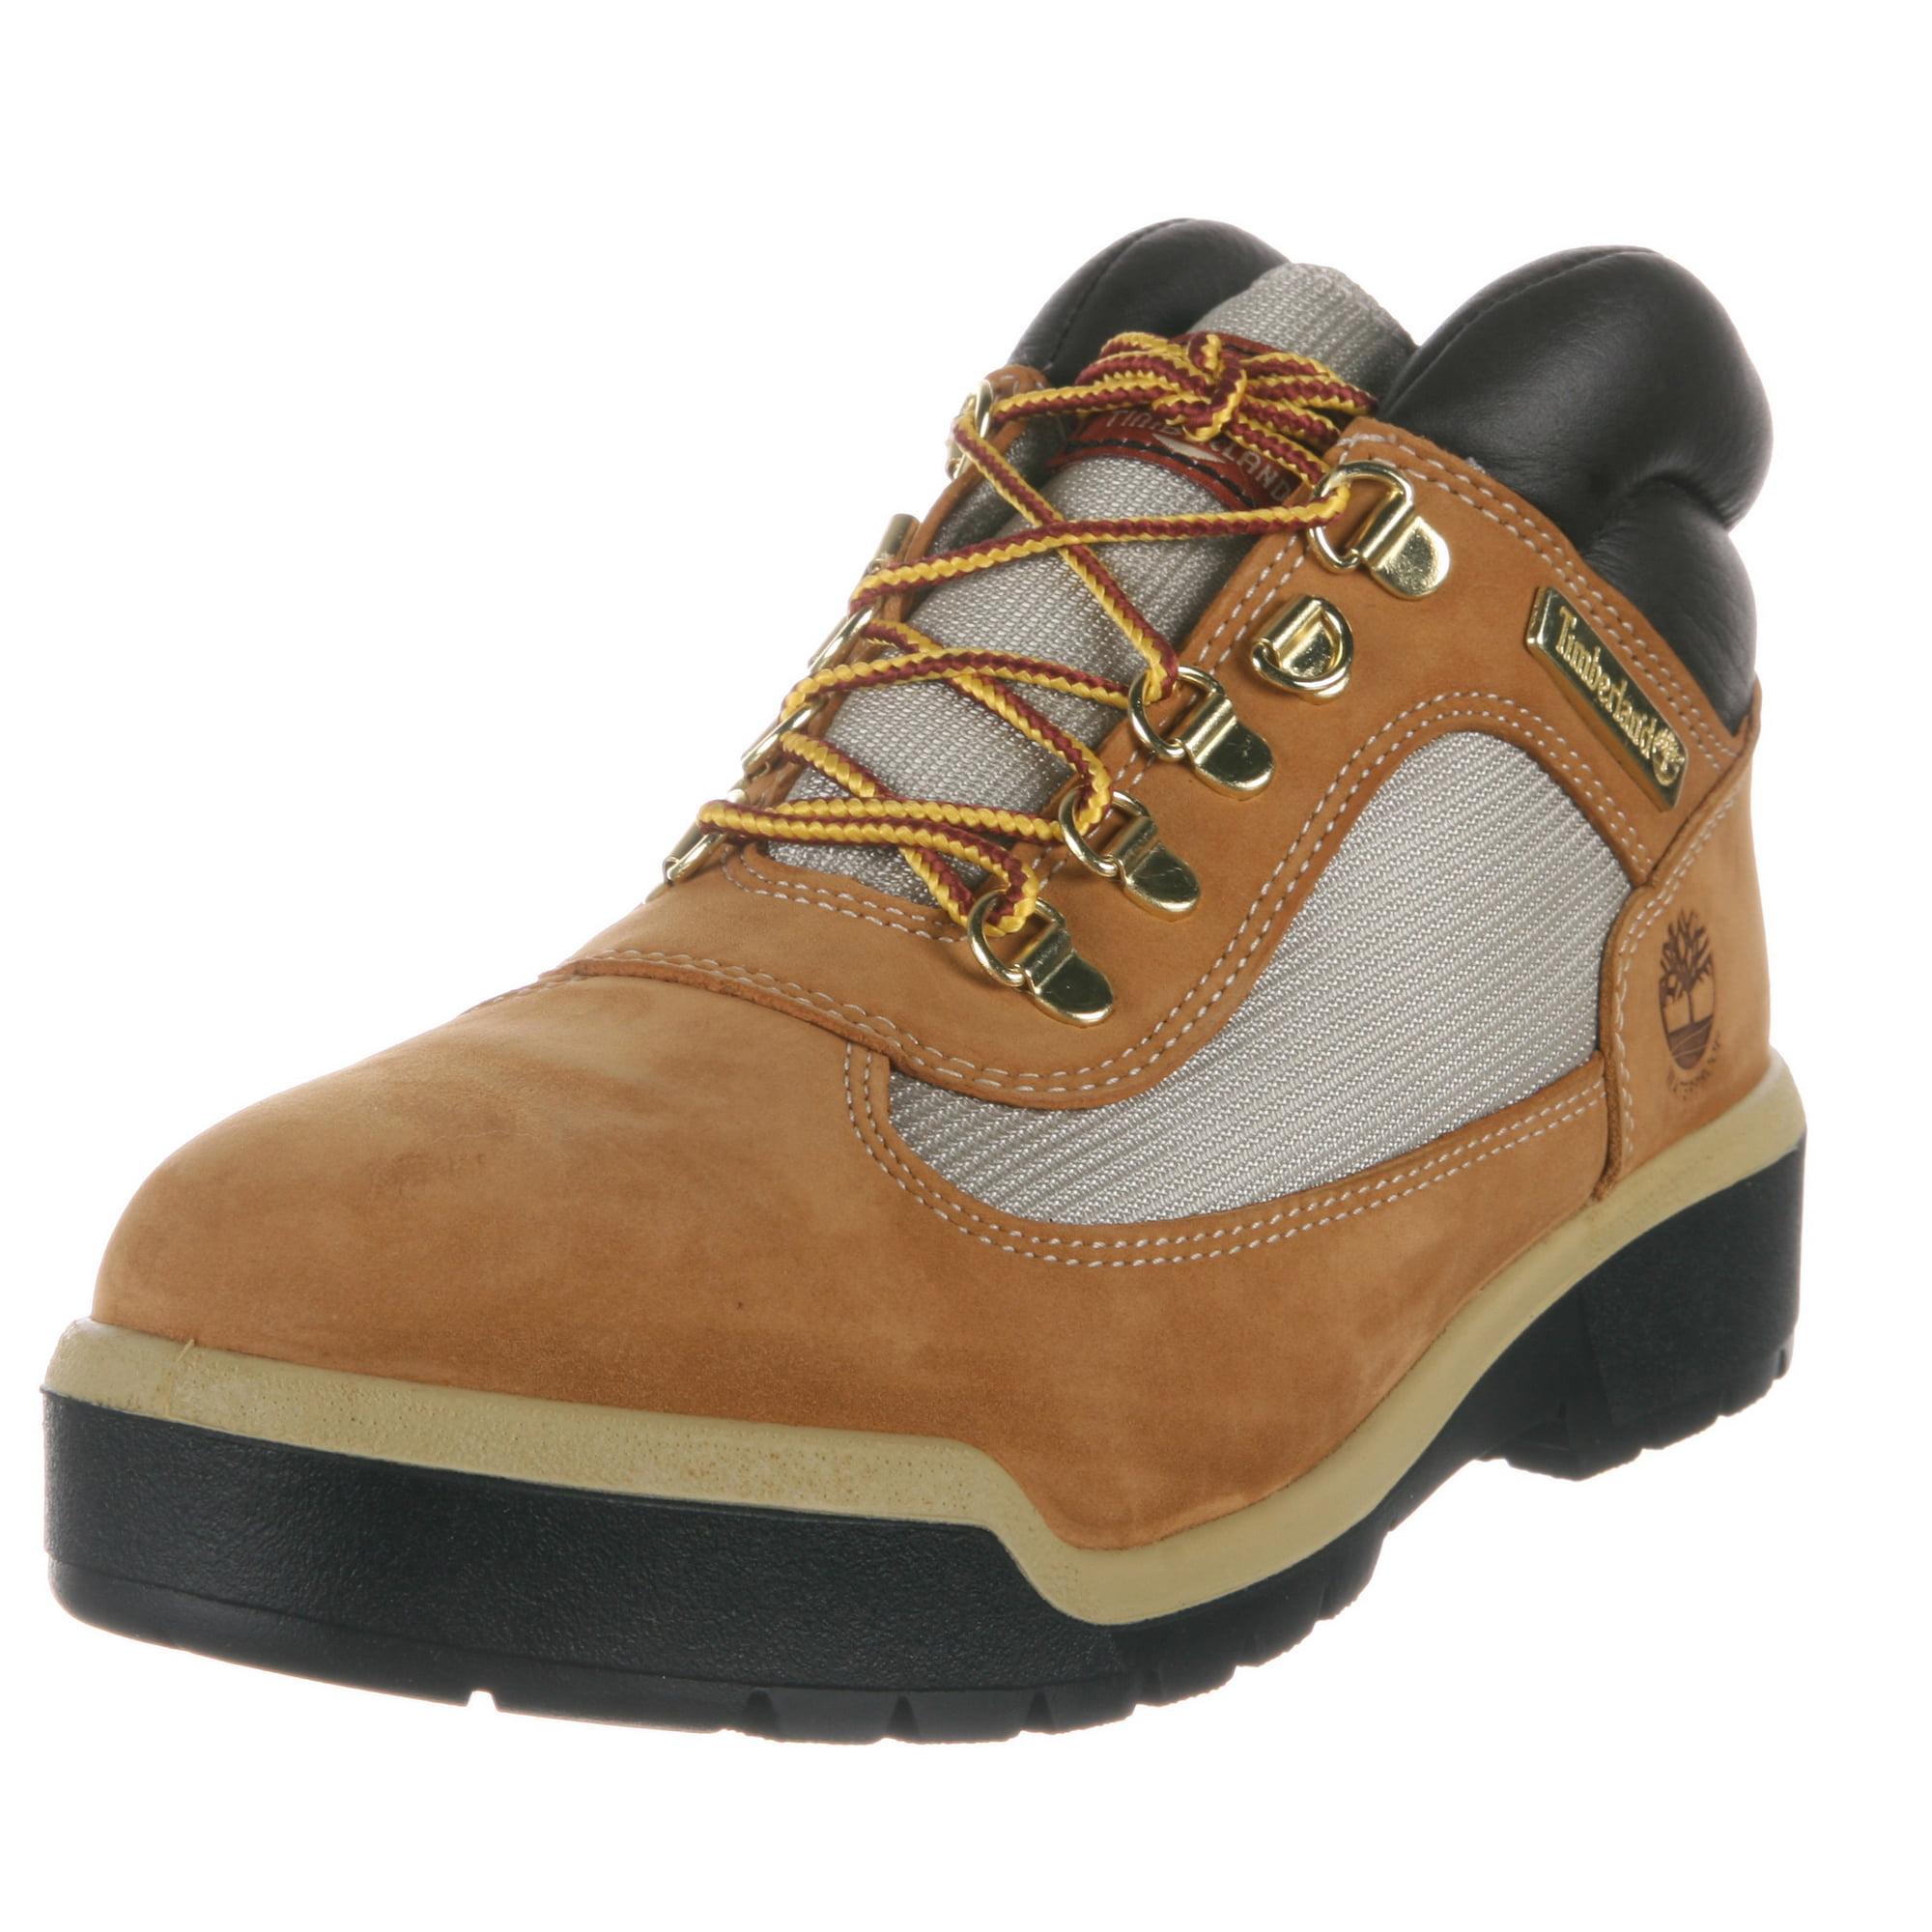 Timberland FIELD Mens Boots F L WP TB0A18RI231 by Timberland